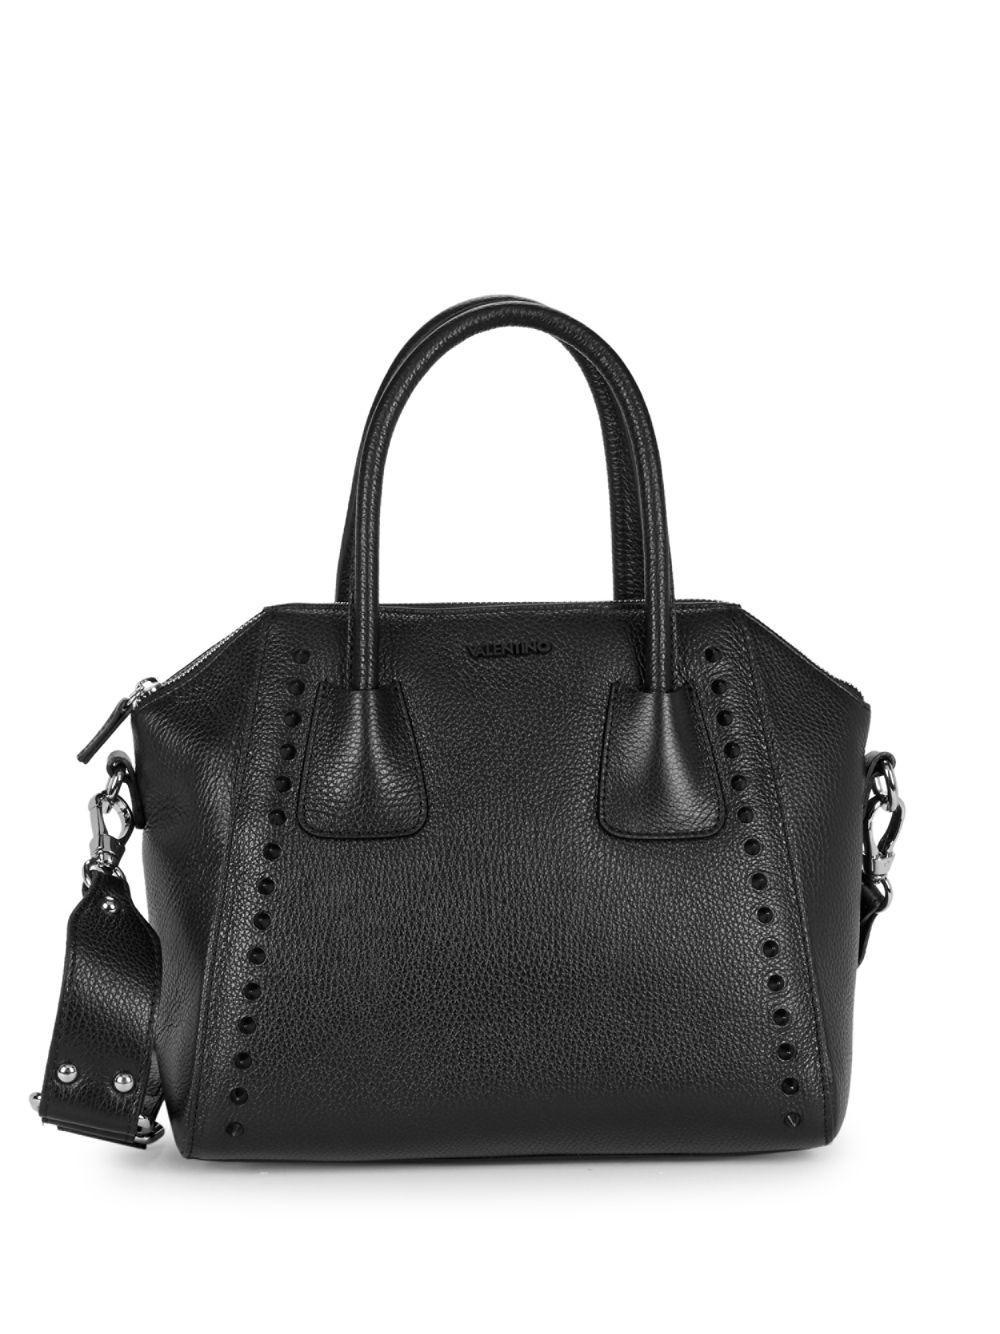 b237ad2e5522 Valentino By Mario Valentino. Women s Black Minimi Pebbled-leather  Structure Satchel